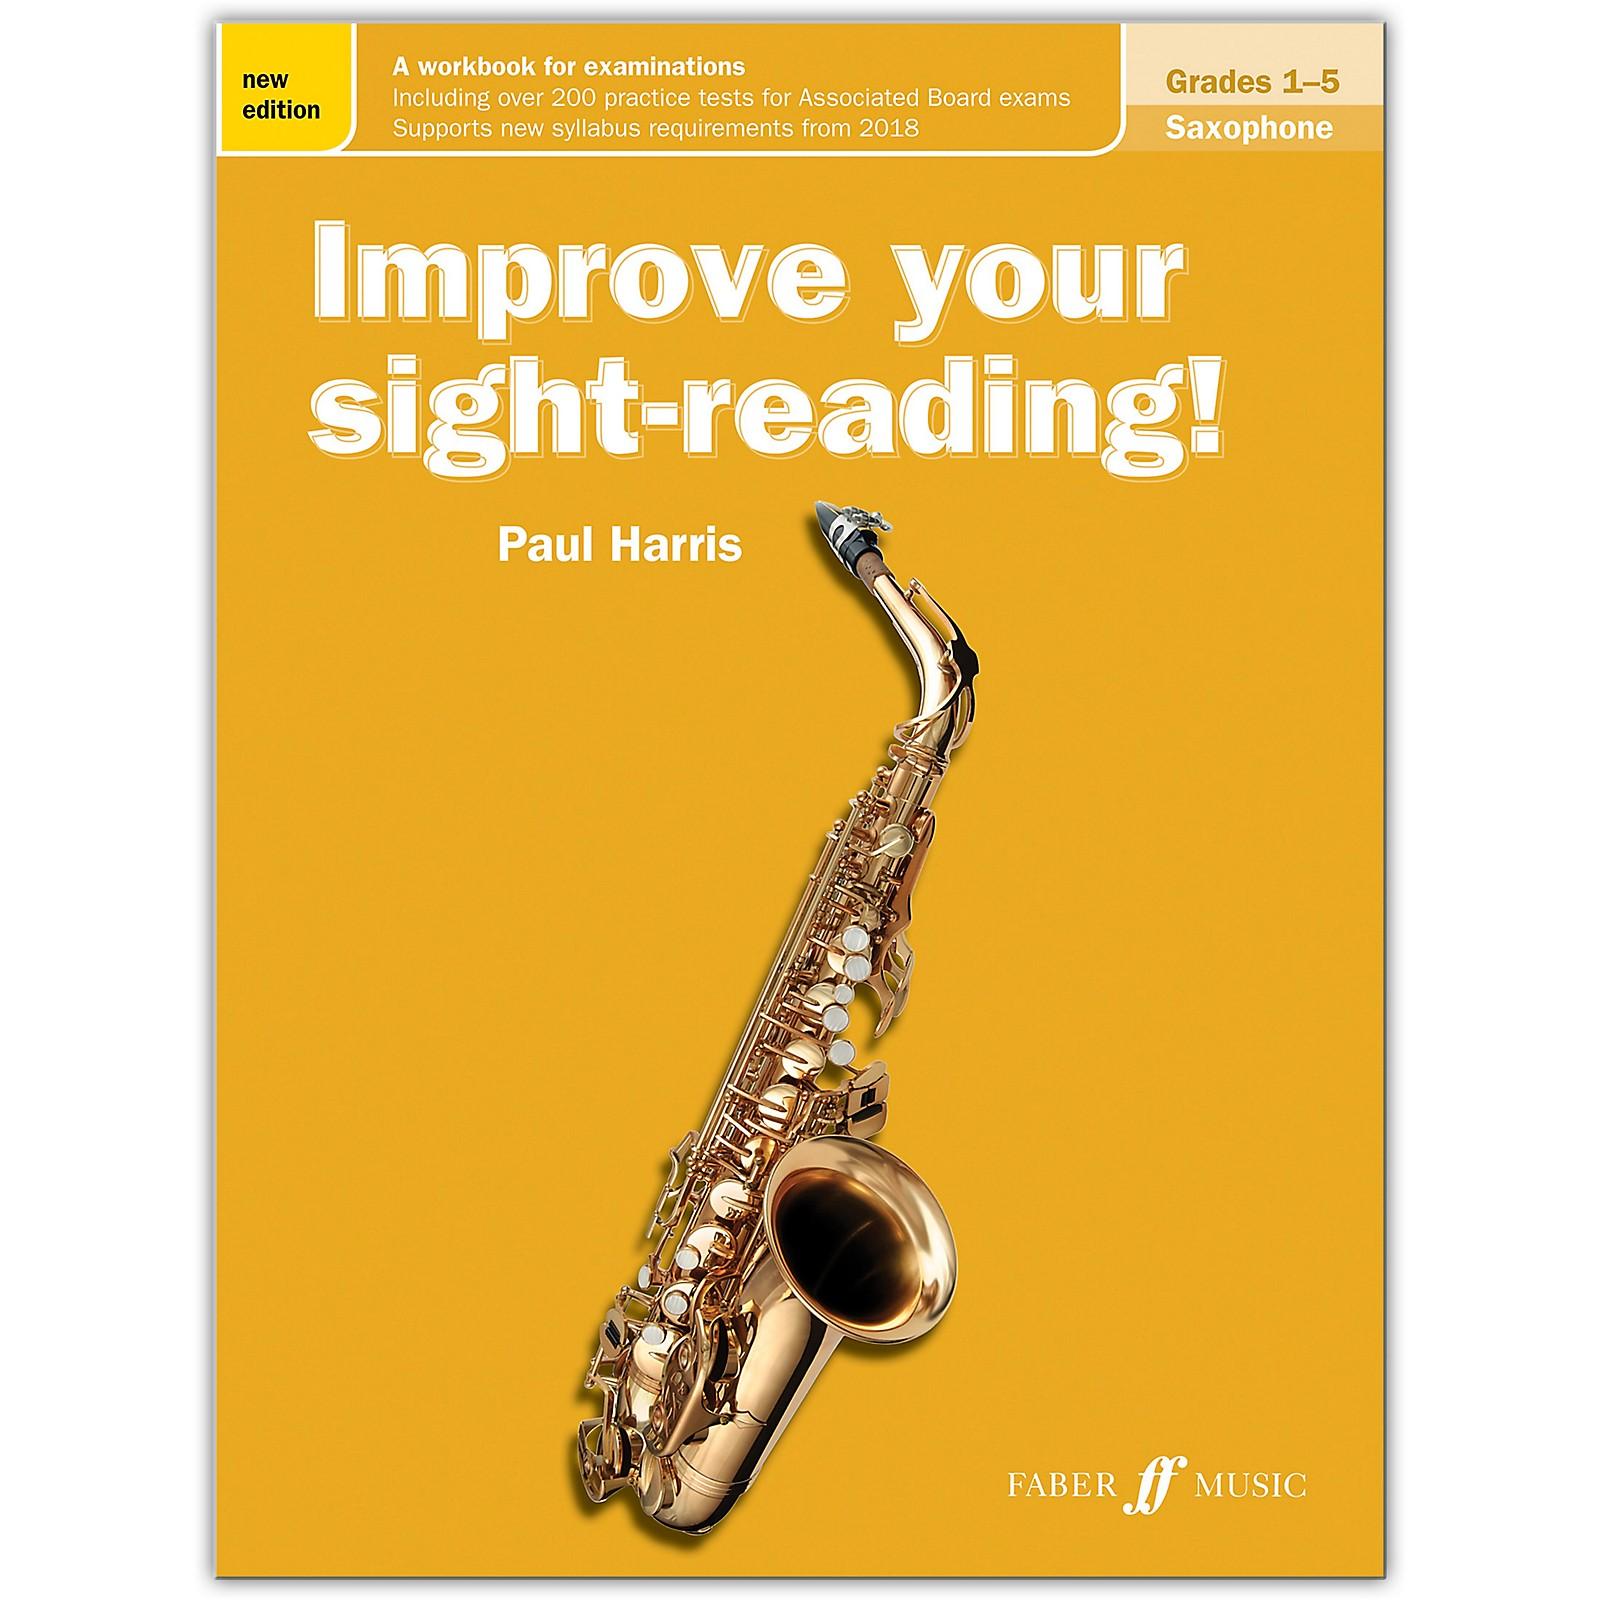 Faber Music LTD Improve Your Sight-Reading! Saxophone, Grades 1-5 (New Edition)